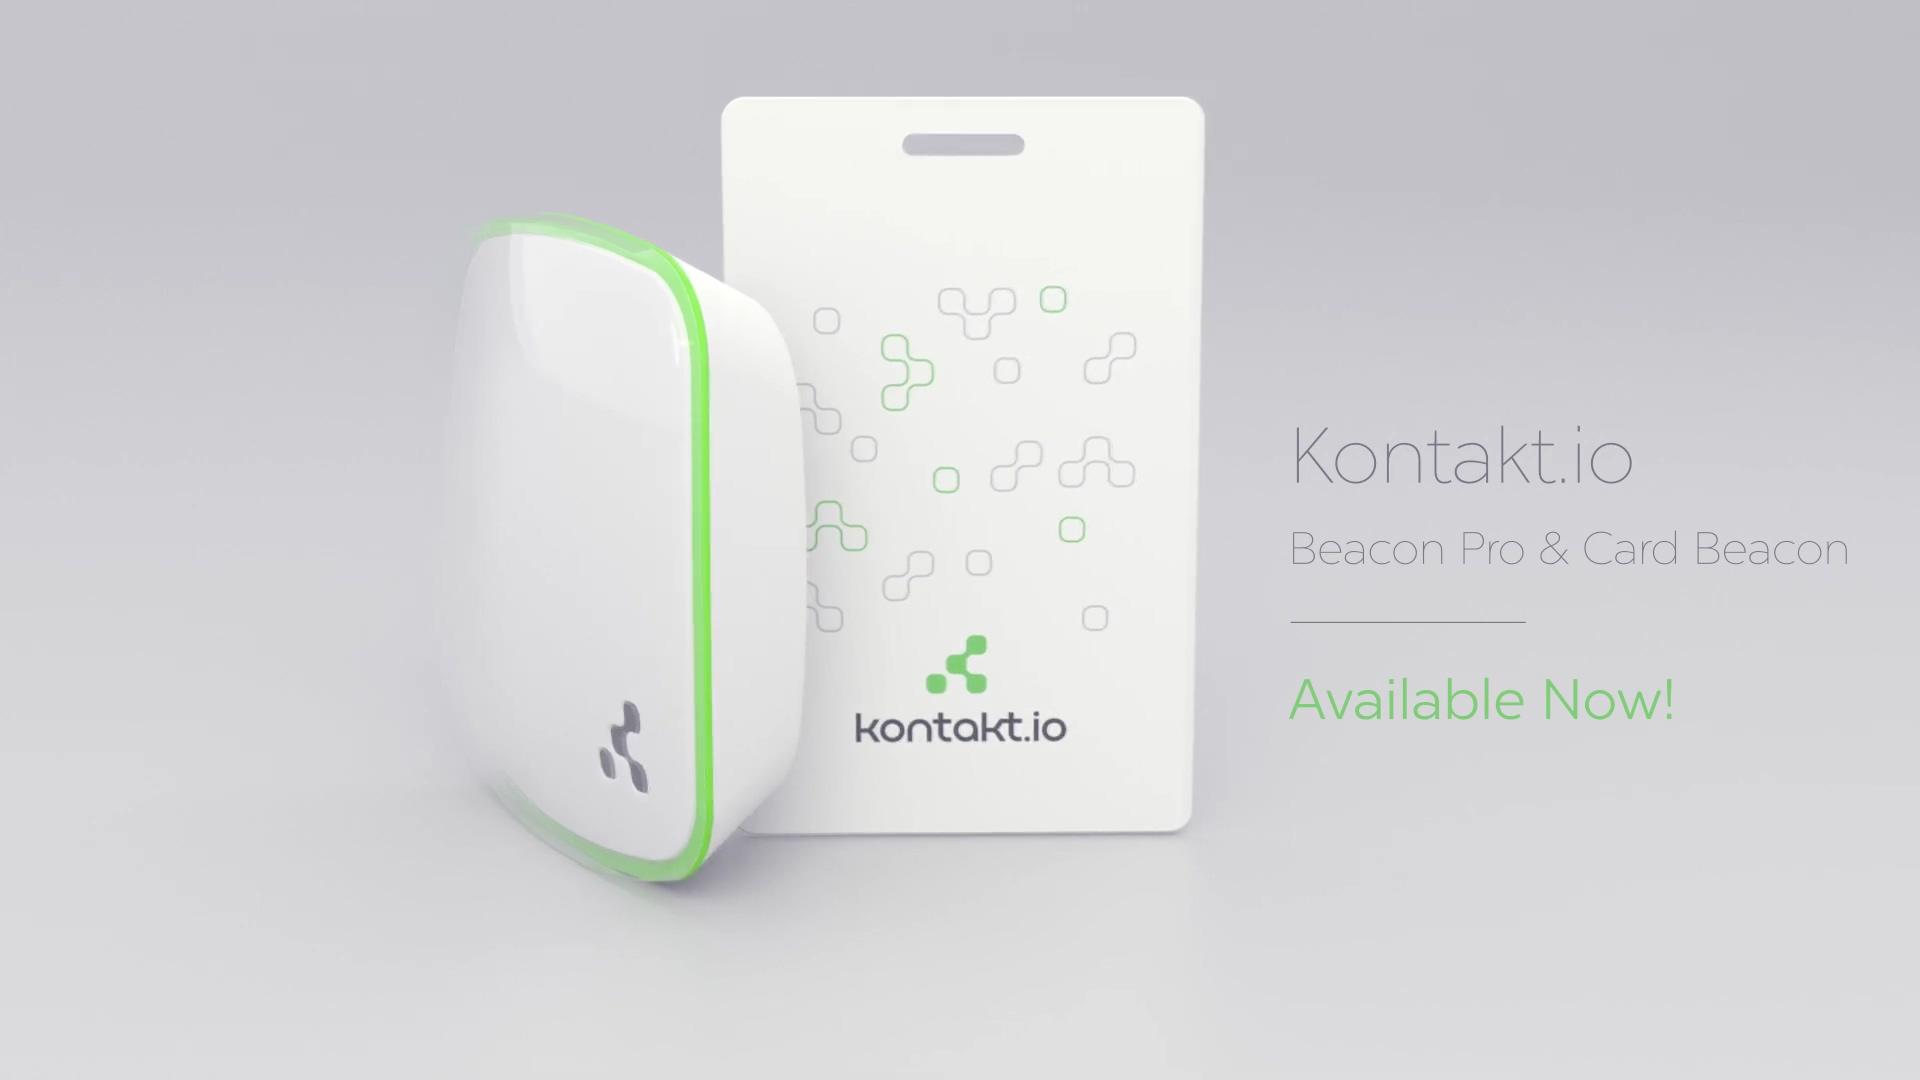 y2mate.com - Kontakt.io Beacon Pro & Card Beacon_EBKf-9QvC5o_1080p